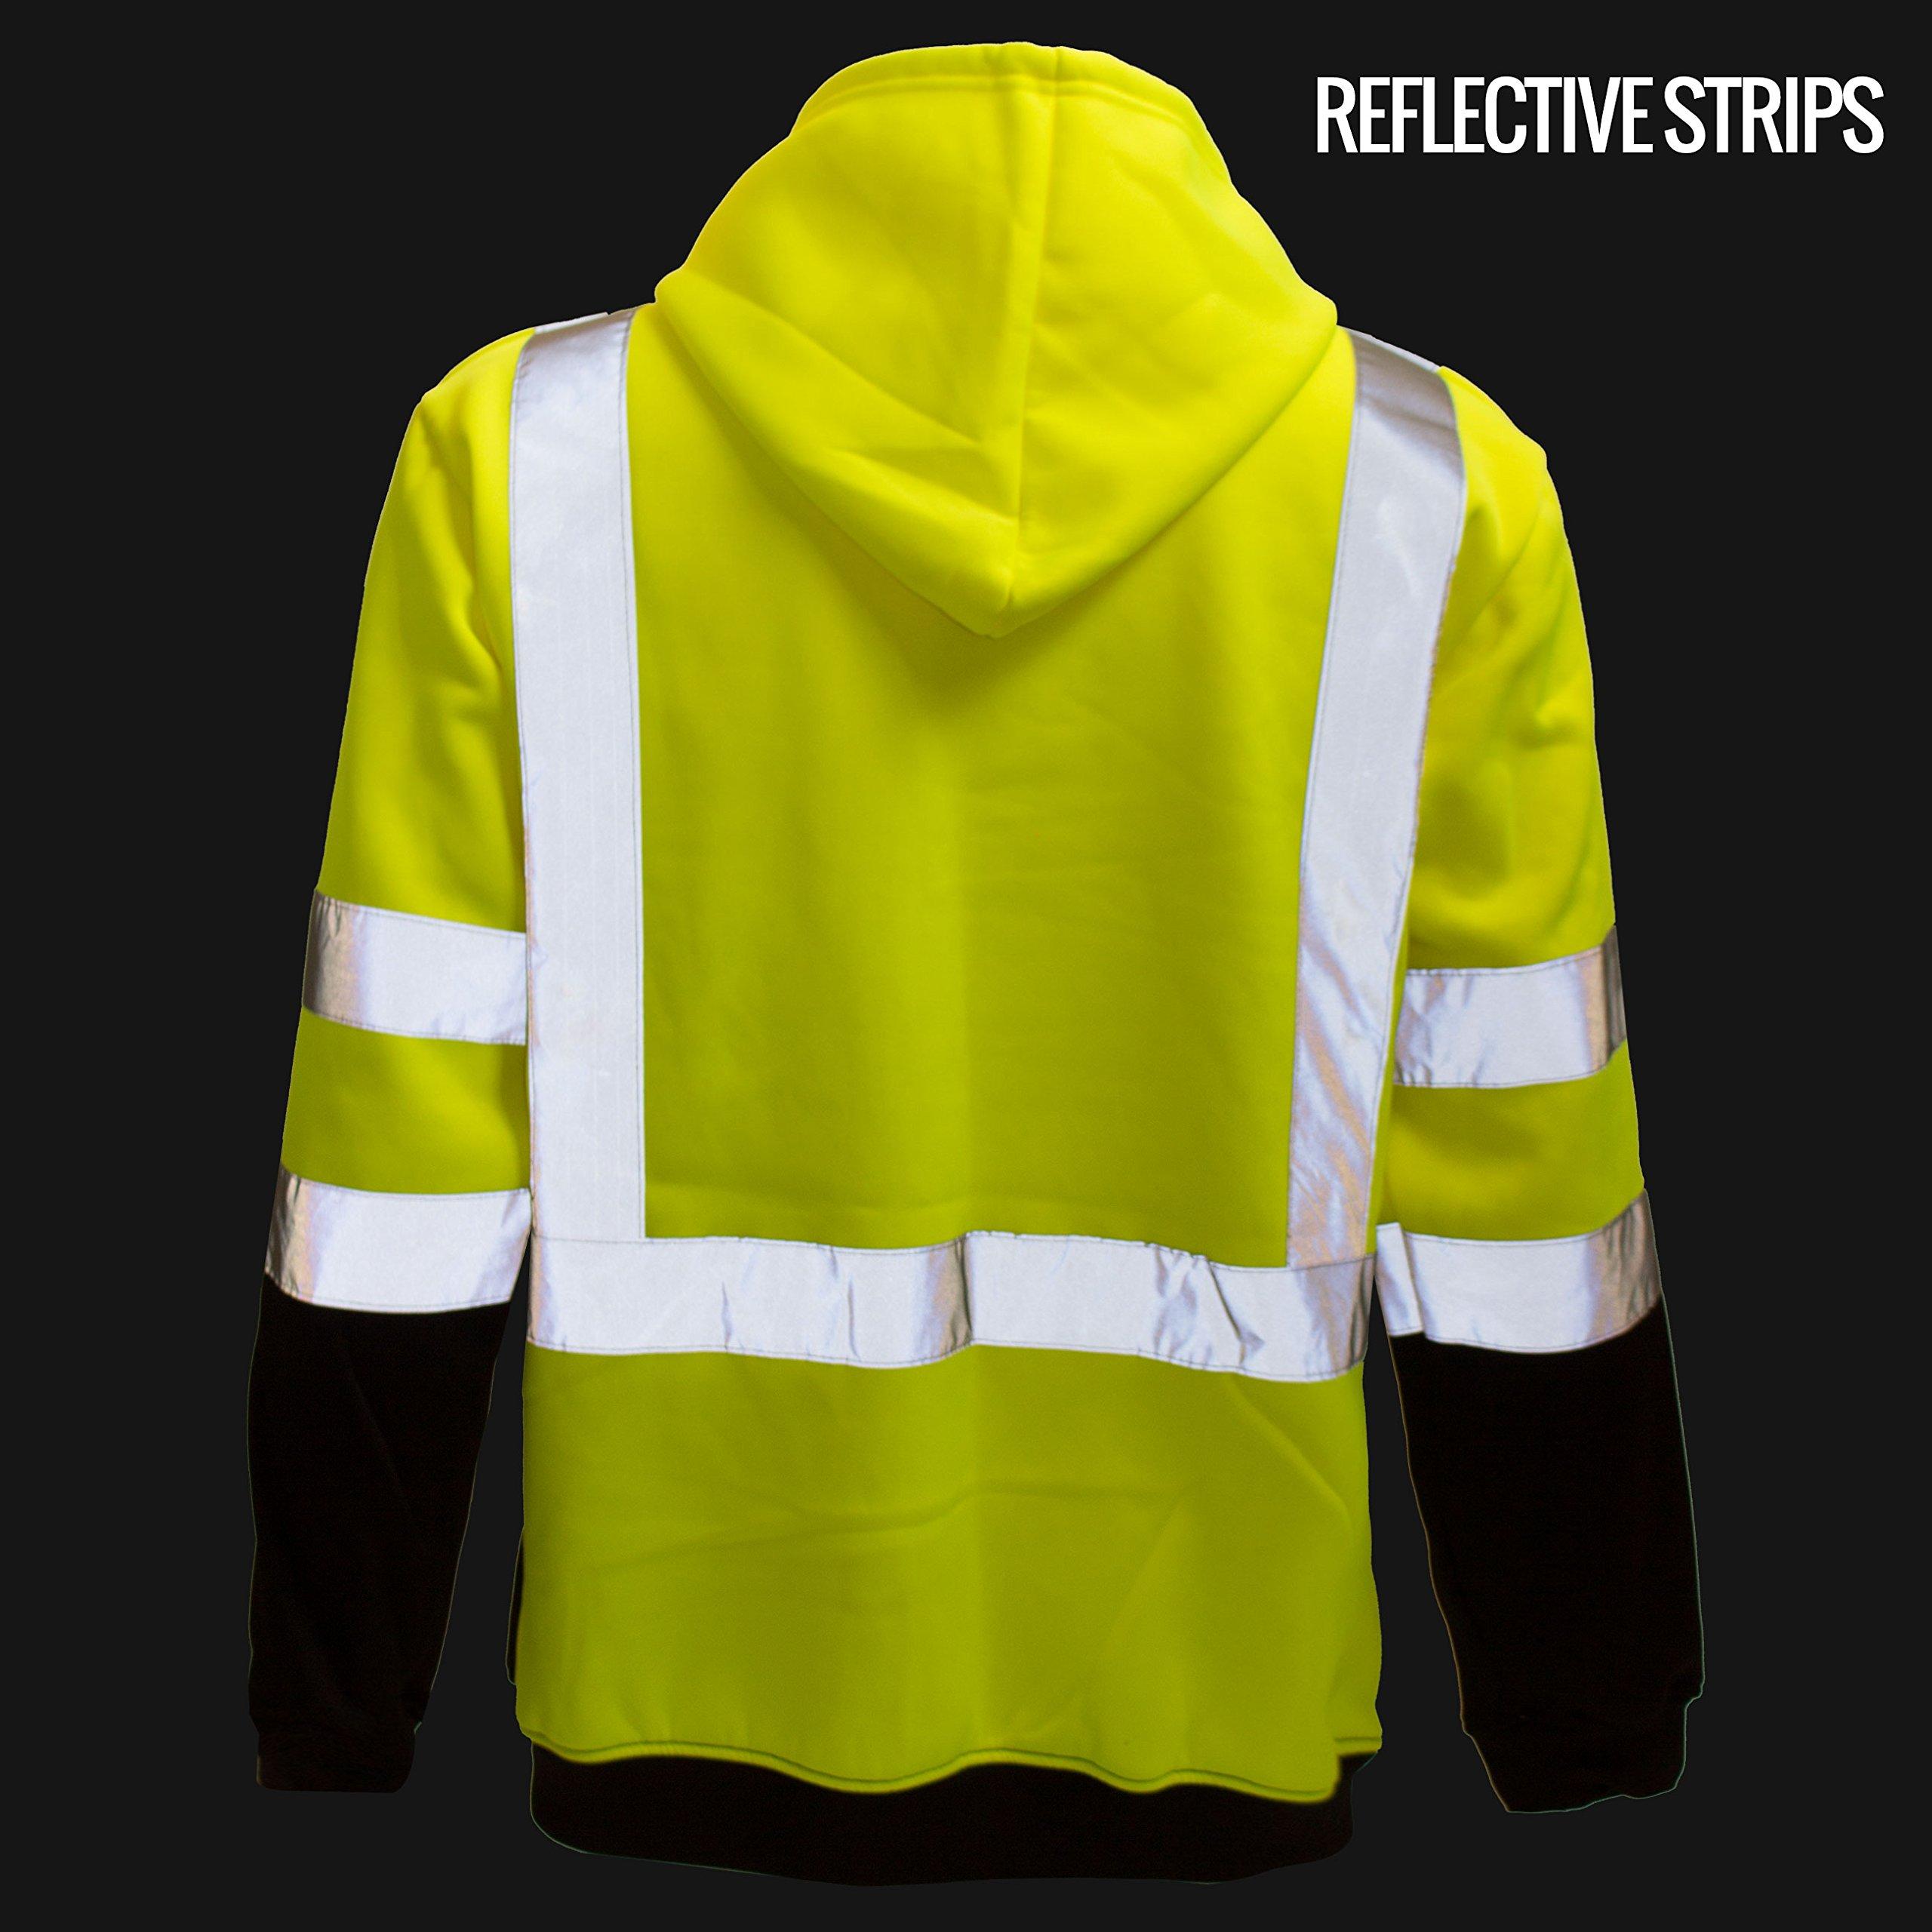 New York Hi-Viz Workwear H9012 Men's ANSI Class 3 High Visibility Class 3 Sweatshirt, Full Zip Hooded, Lightweight, Black Bottom (XX-Large) by New York Hi-Viz Workwear (Image #5)